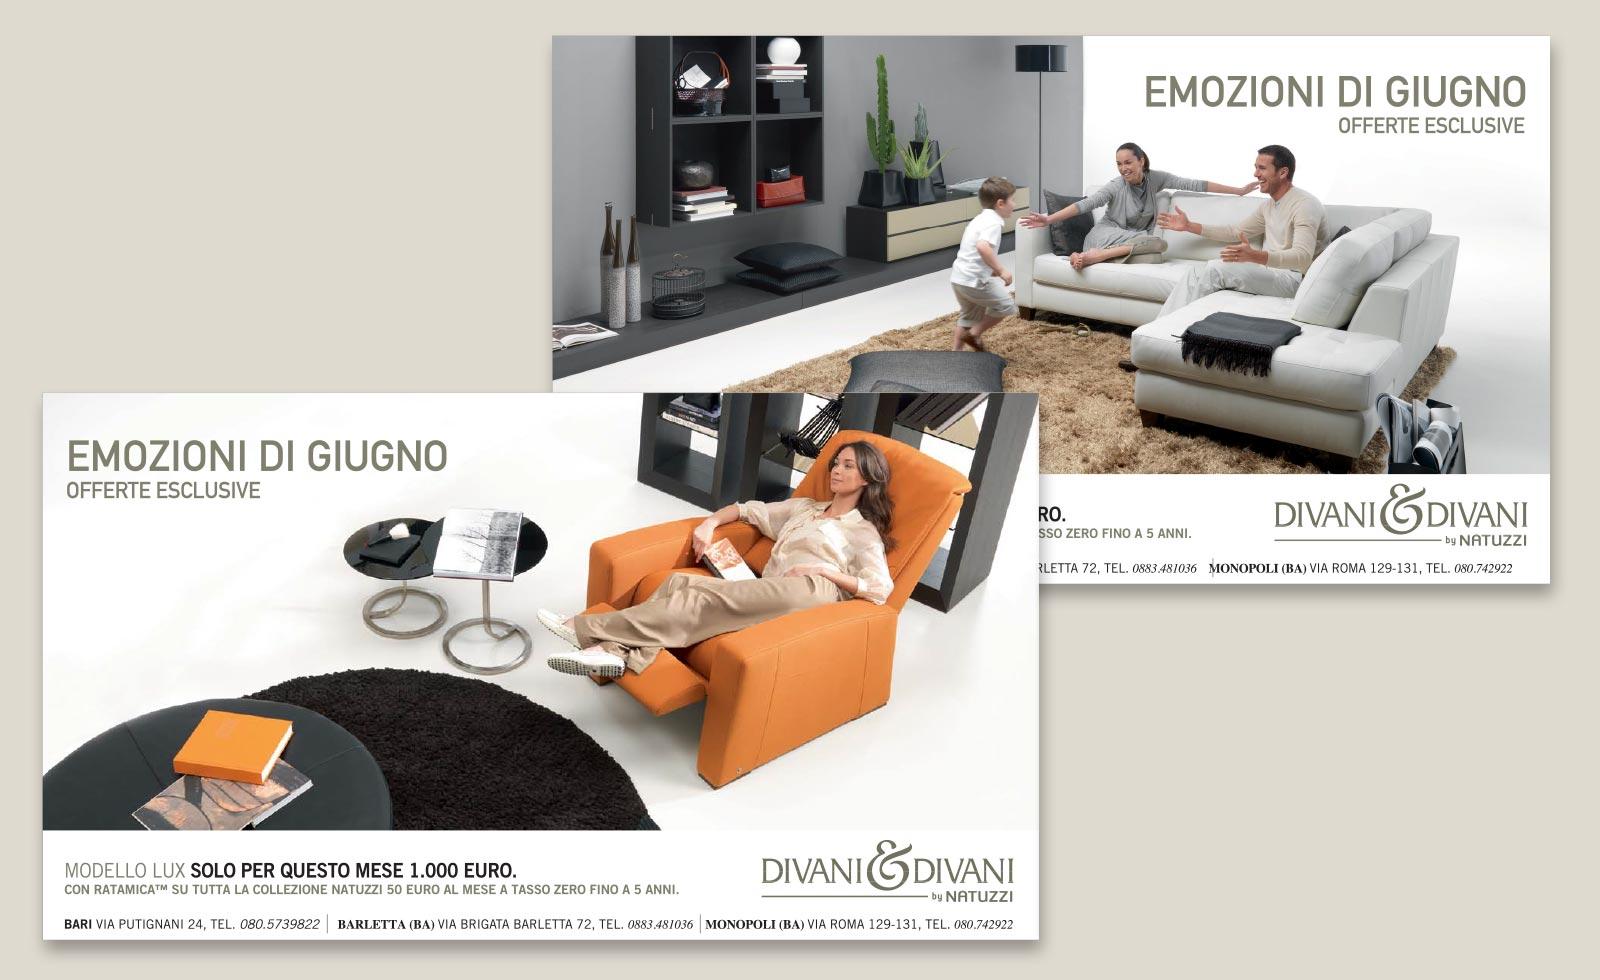 divani&divani divaniedivani furniture arredamento sofa maggipinto pitscheider